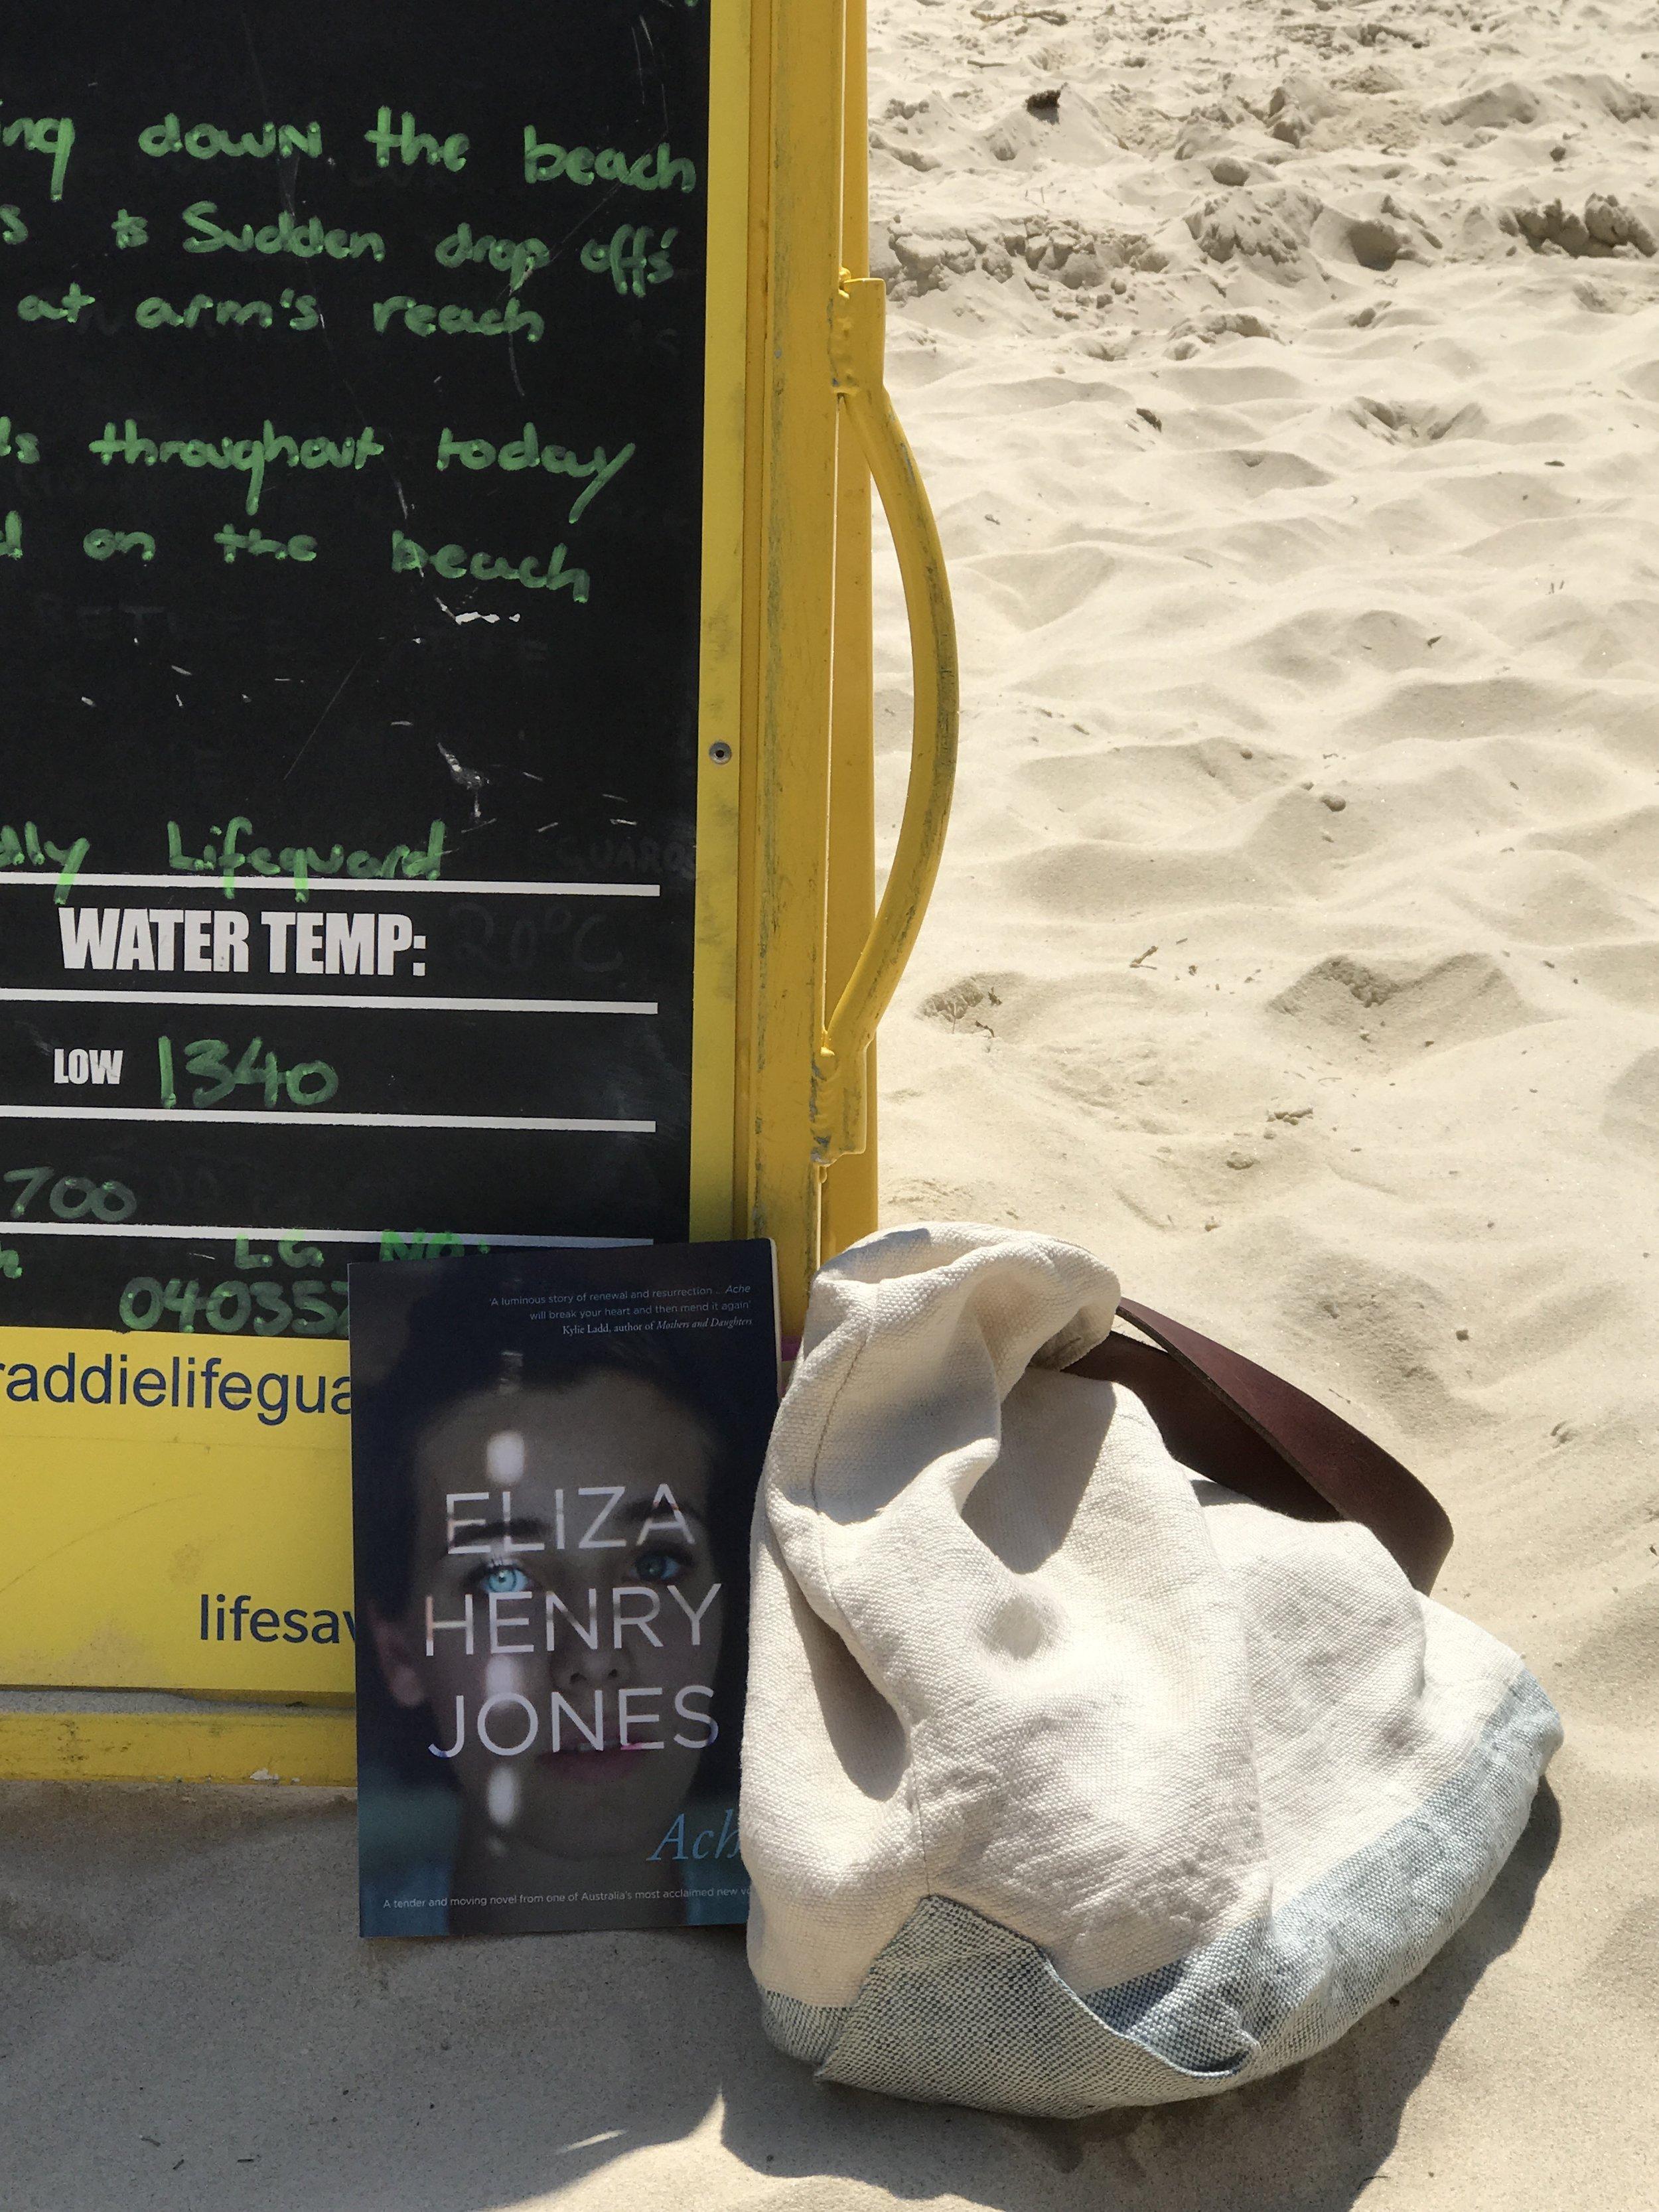 Cylinder Beach ready with 'Ache'